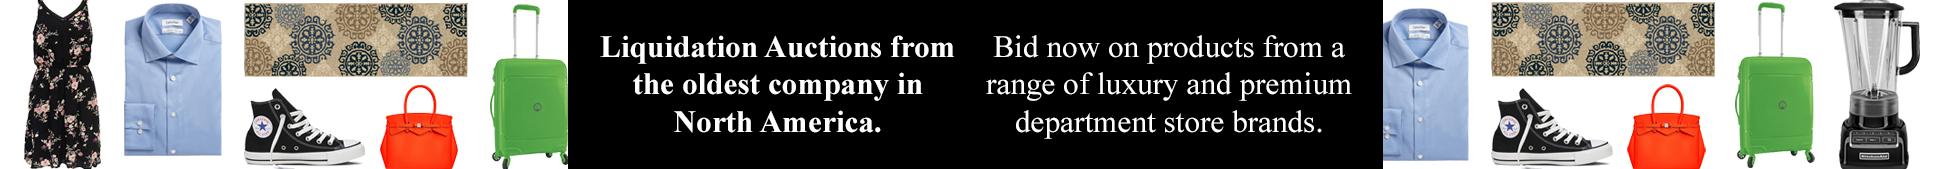 Hudson's Bay Liquidation Auctions Launch